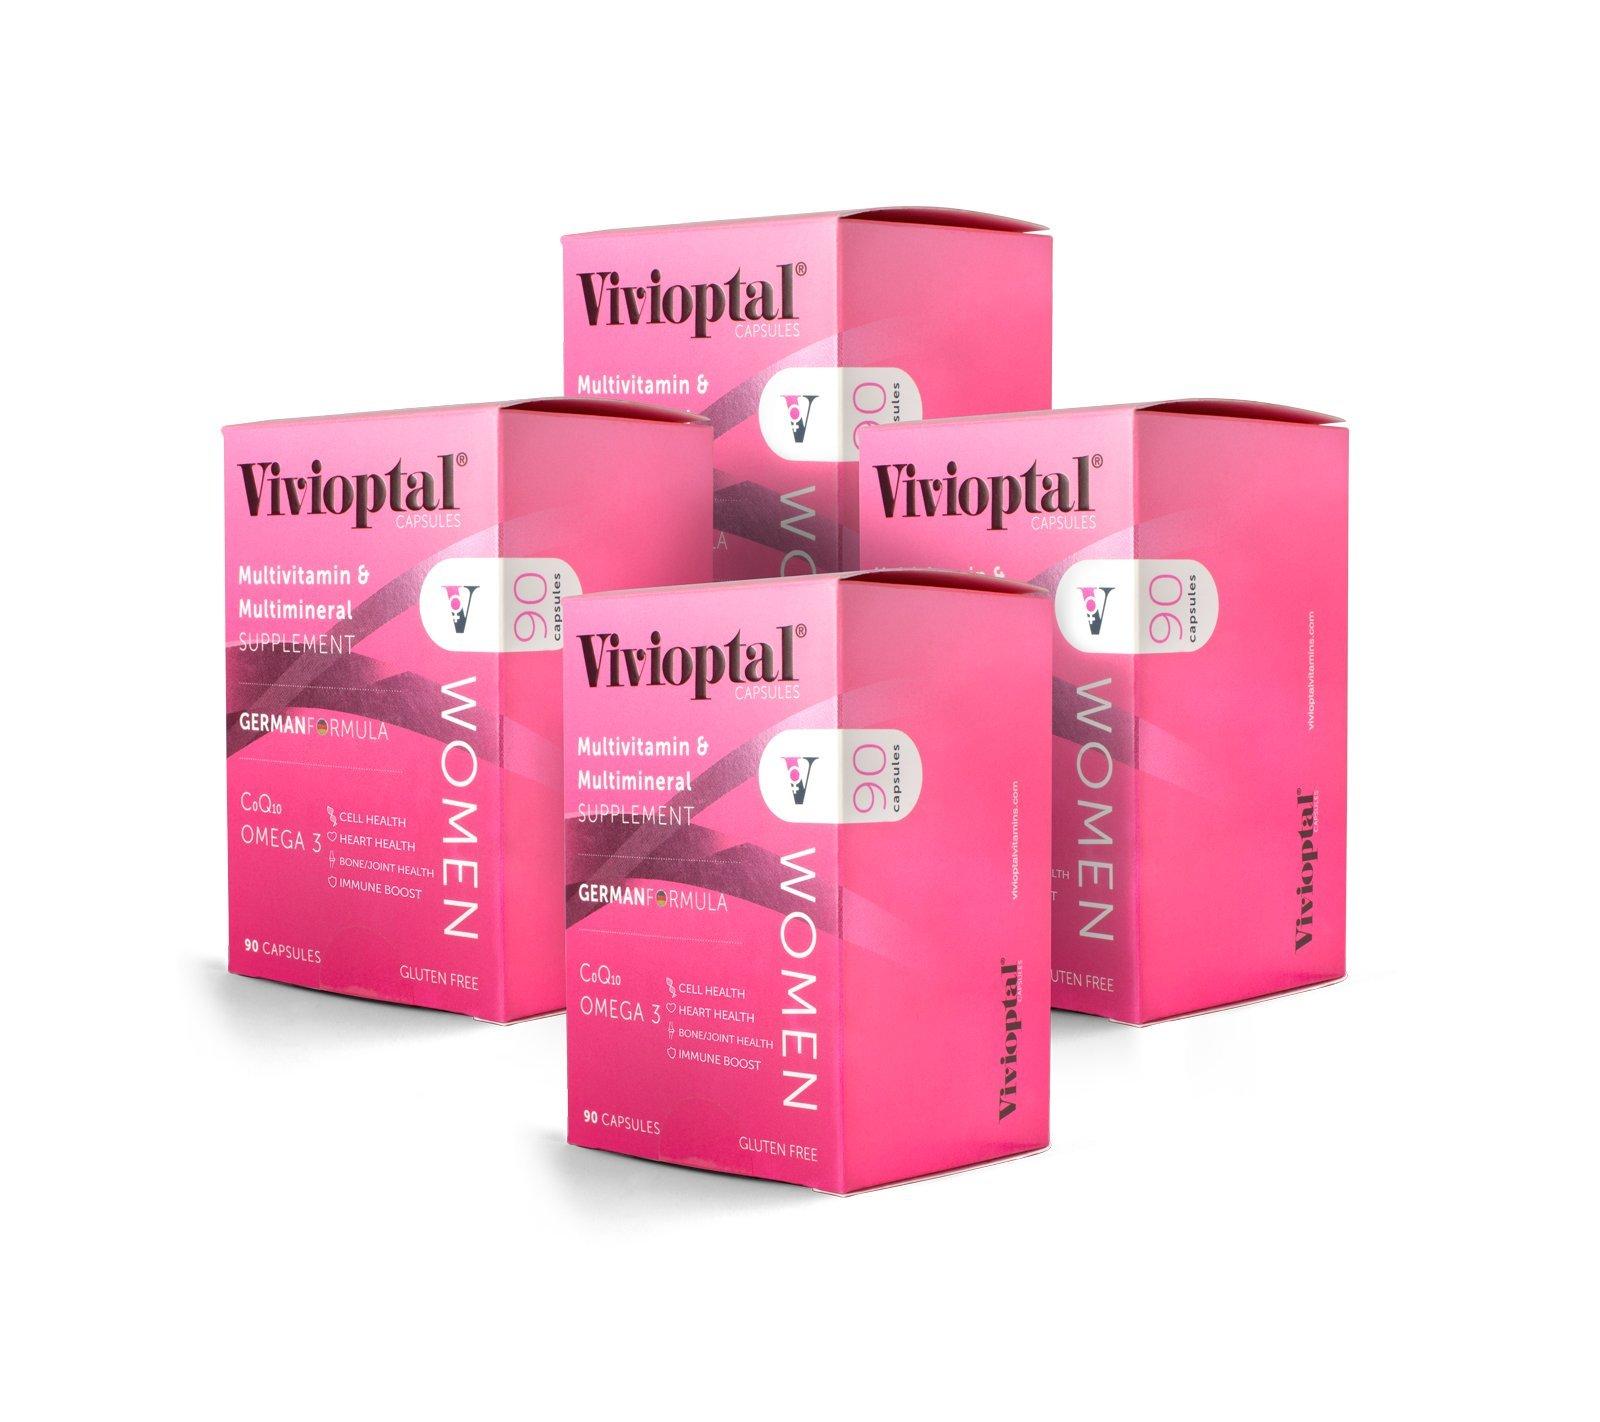 Amazon.com: Vivioptal Protect for Men 1 Year Supply..